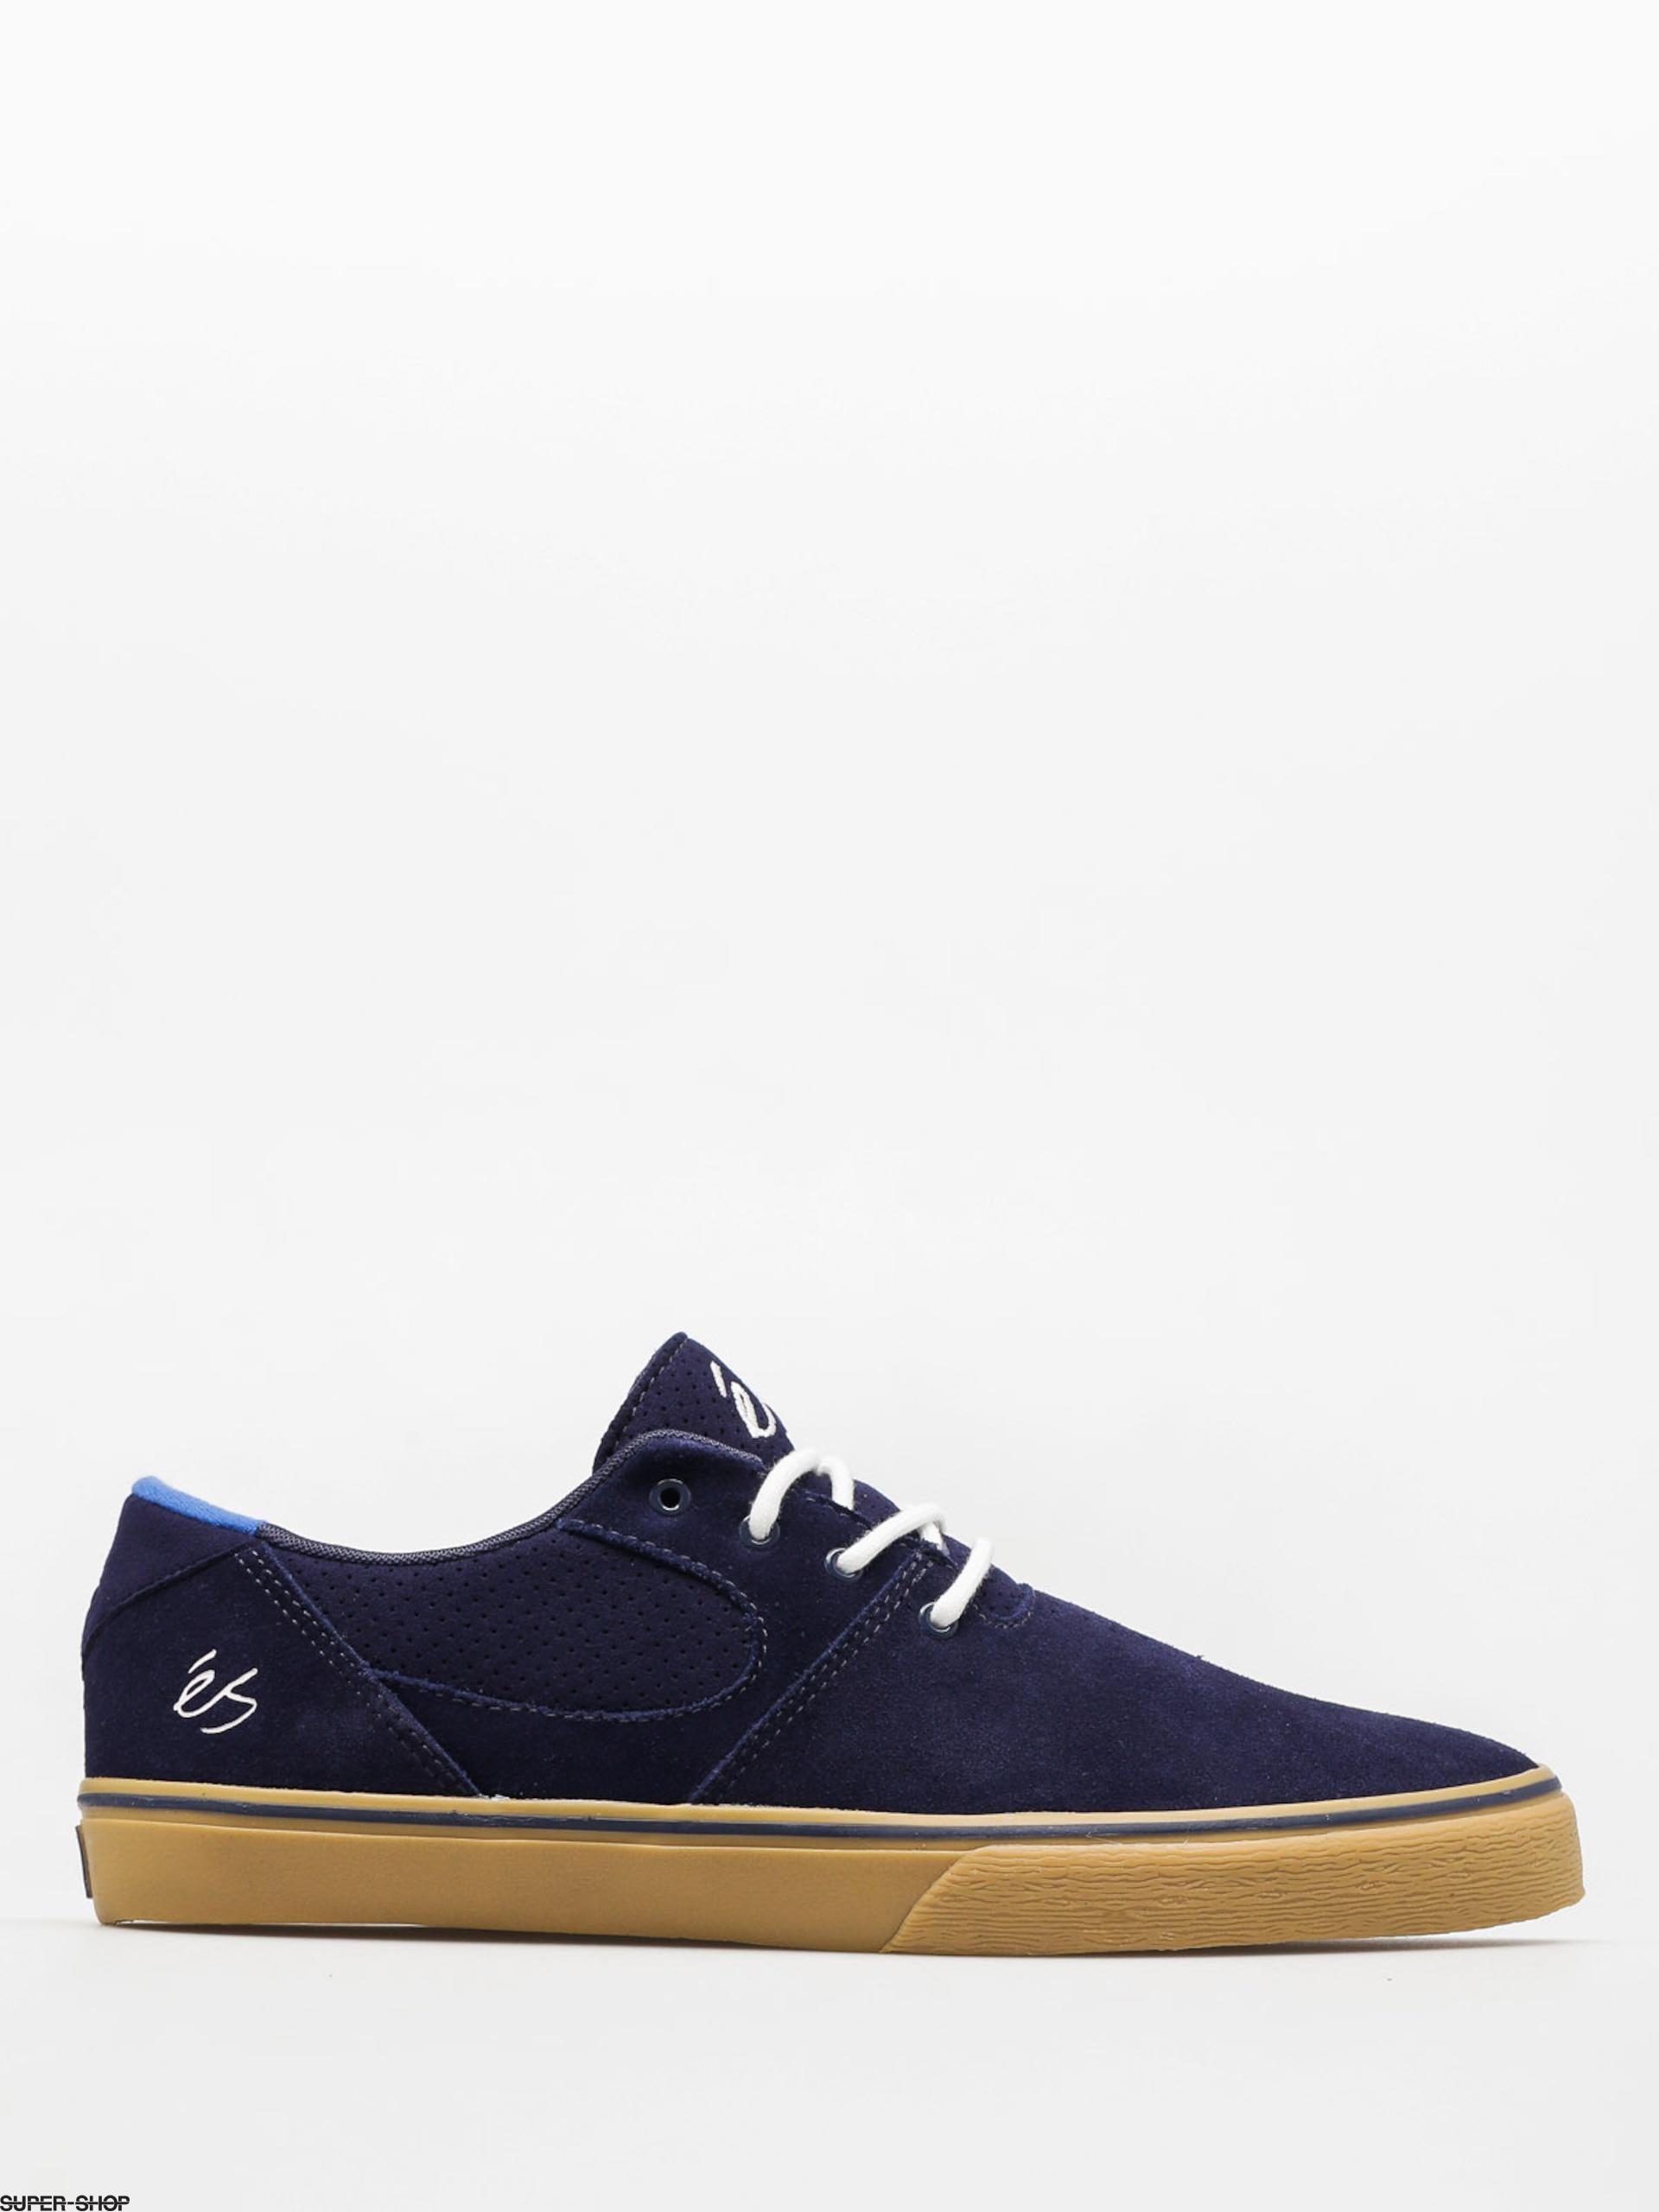 Chaussures de Skateboard Homme Emerica Wino G6 Navy Gum White